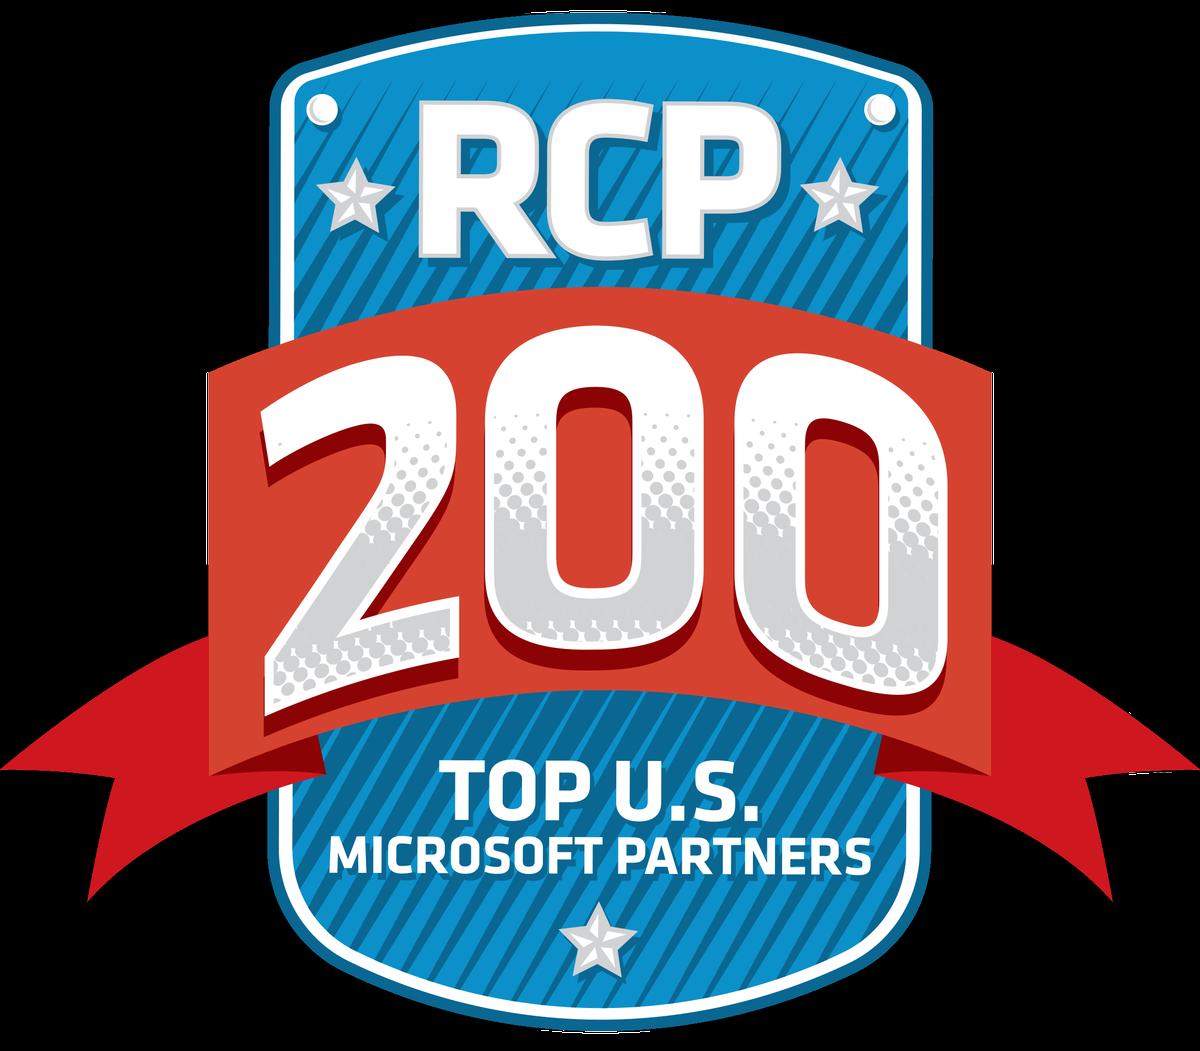 Microsoft Partner, Top Microsoft Partner, San Jose, CA, Redmond Channel Partner